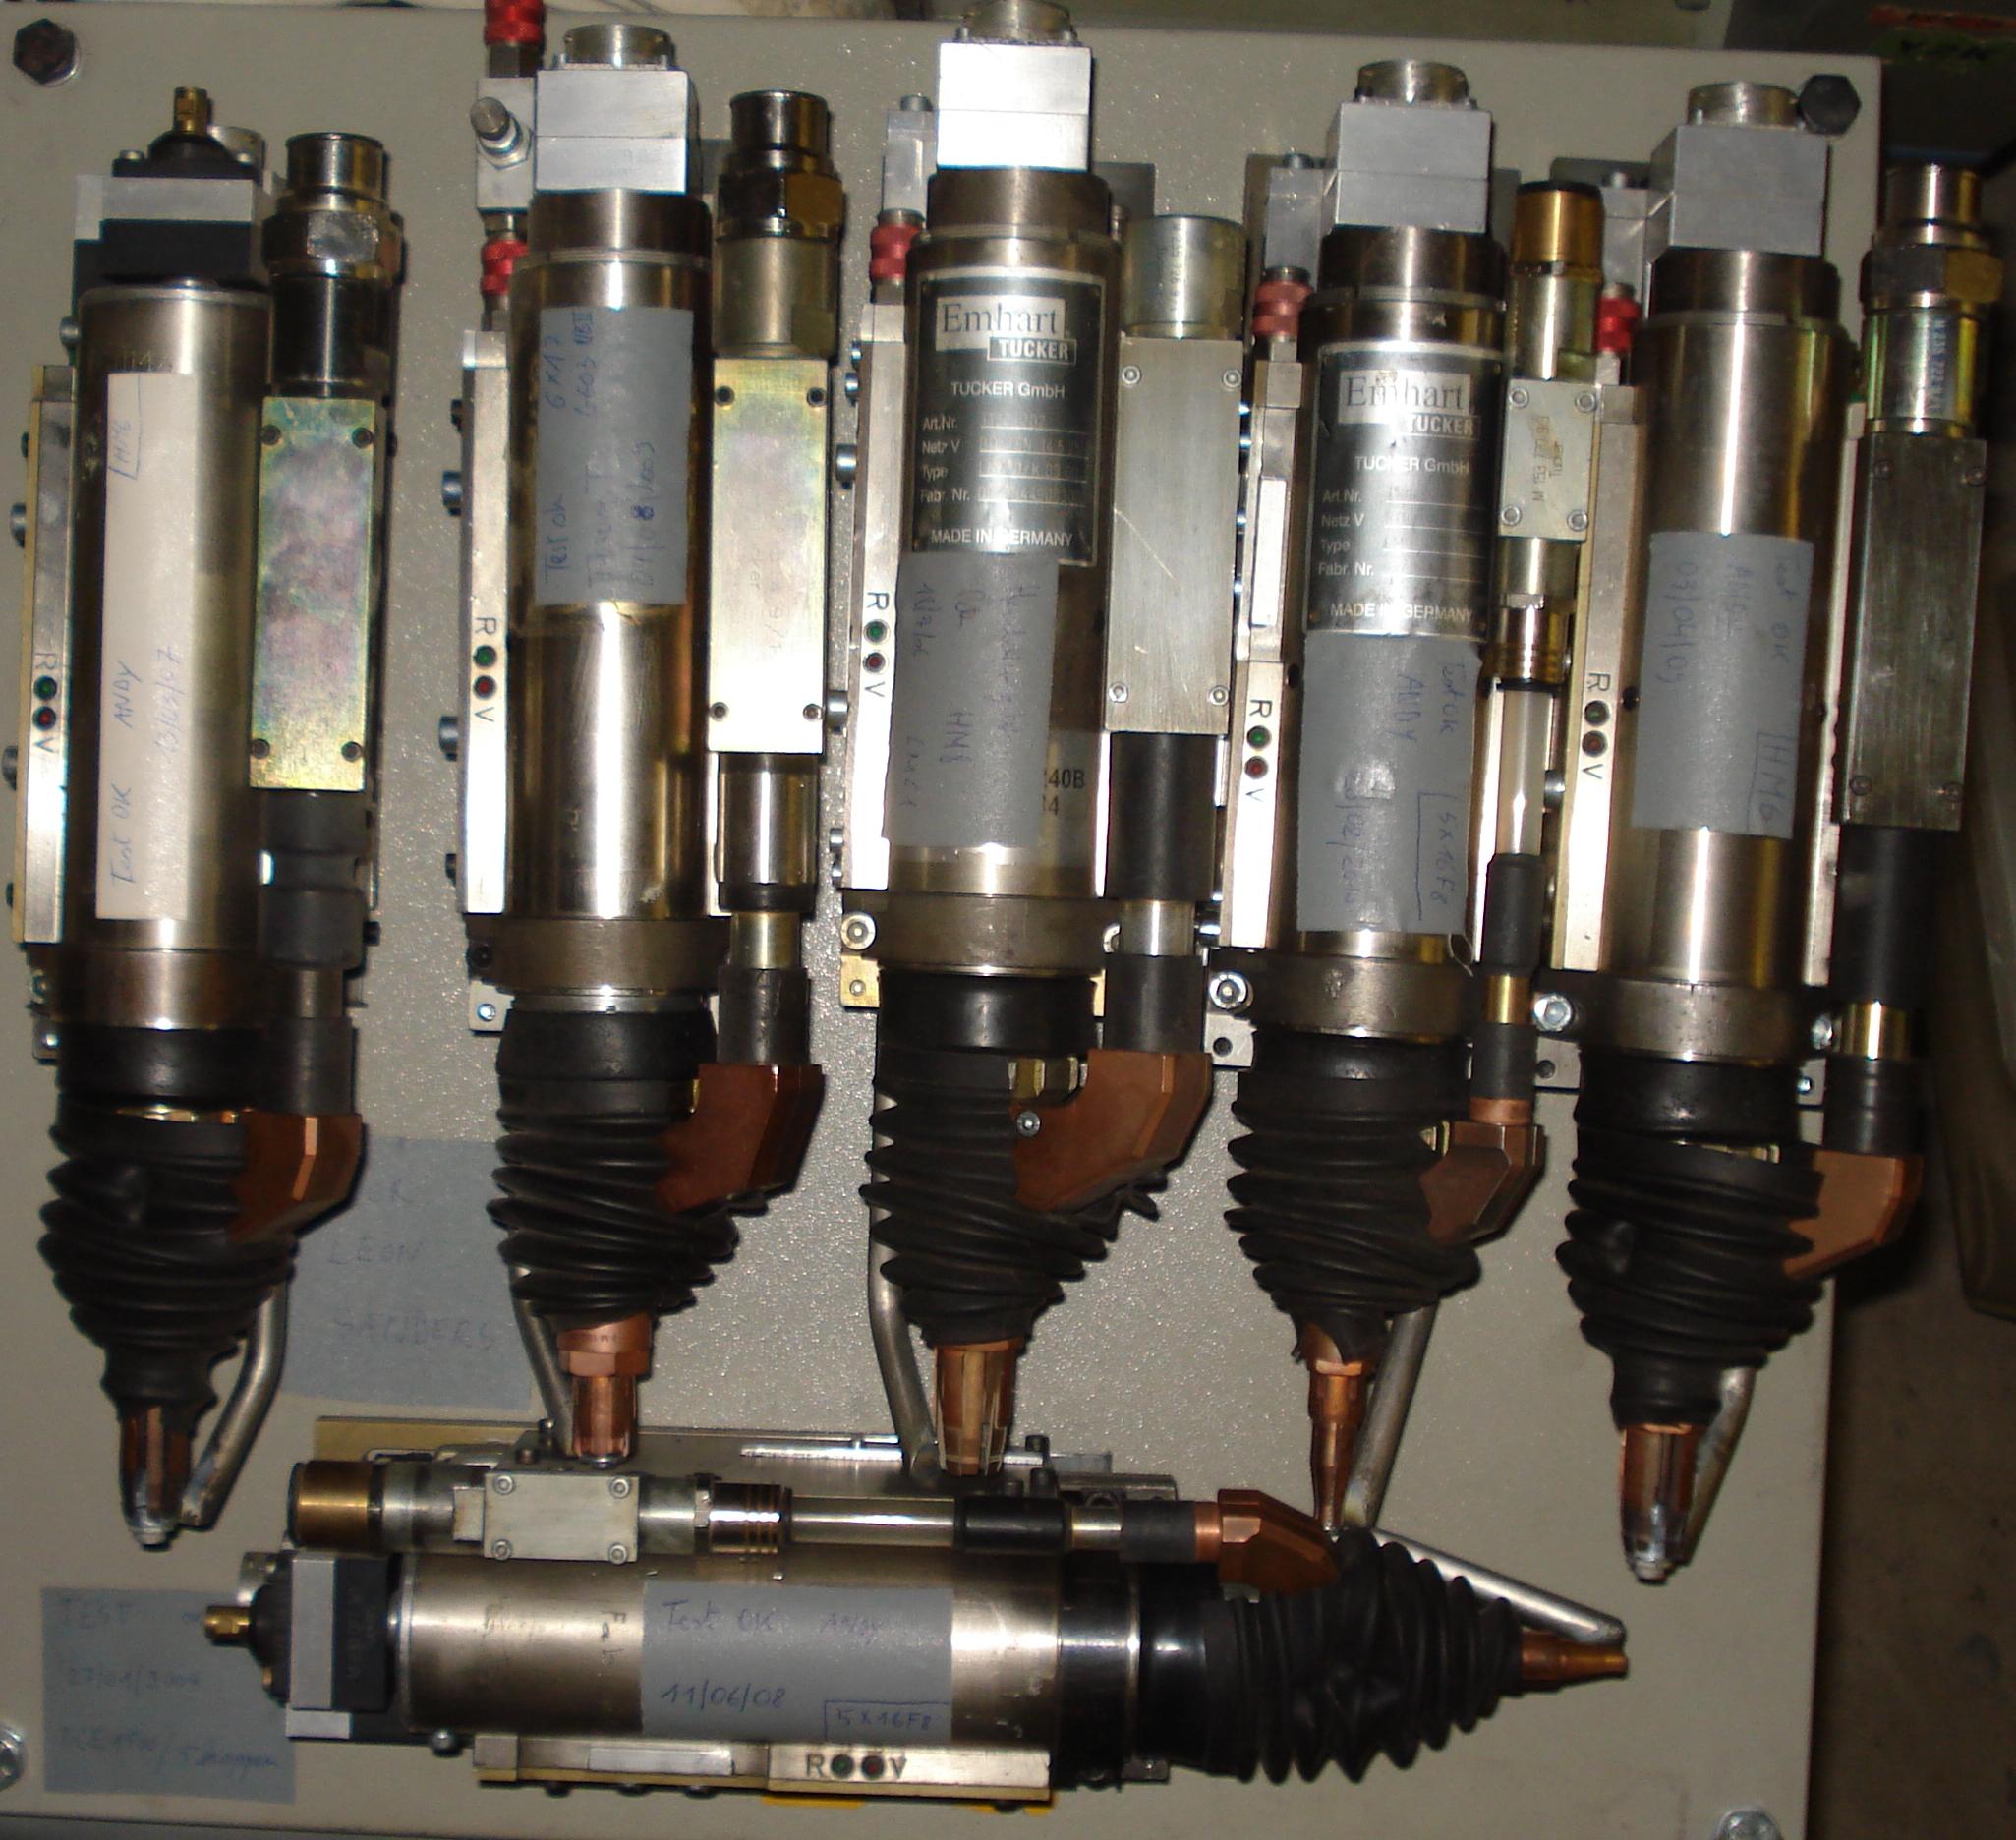 sales of re use equipment rh drive eng be emhart dce 1500 programming manual Emhart Pop Rivet Gun